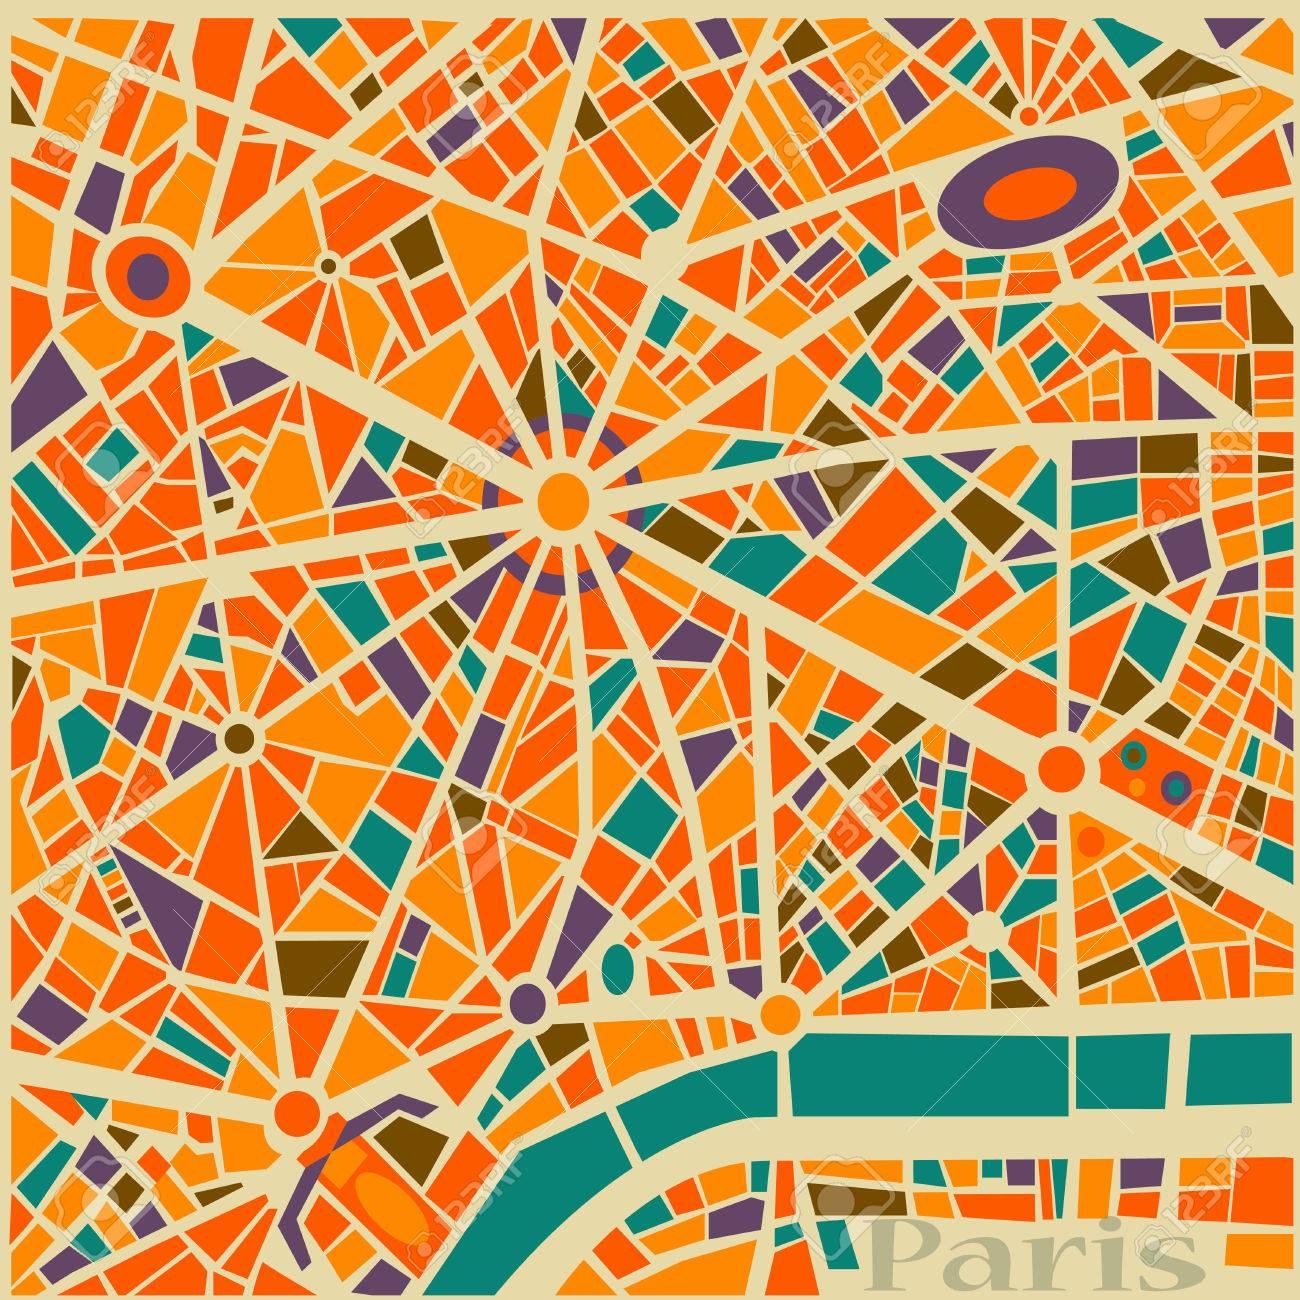 Old paris street map royalty free stock photo image 15885665 - Jpg 1300x1300 Paris Map Background